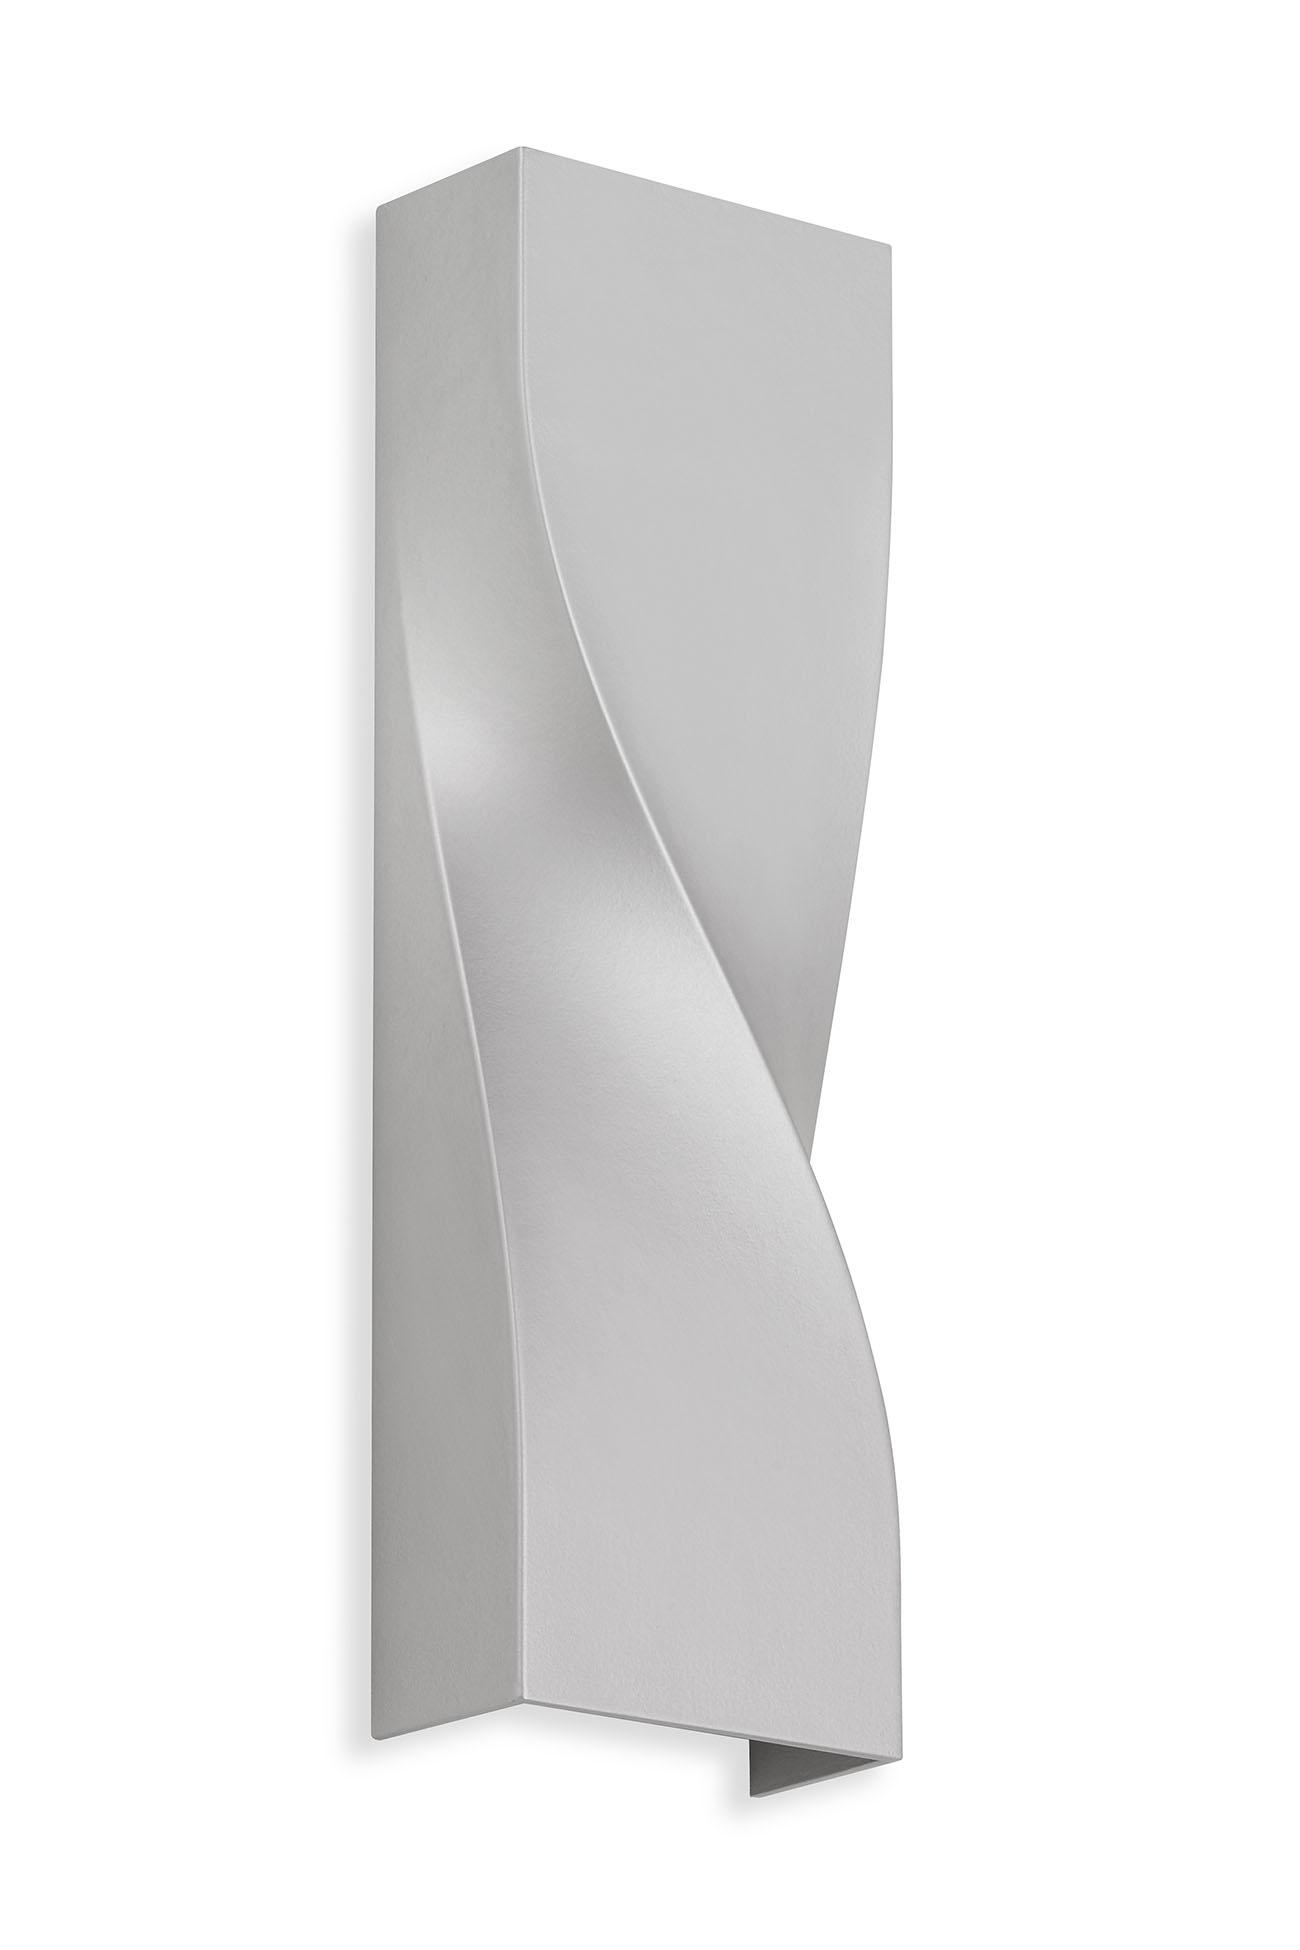 TELEFUNKEN LED Aussenwandleuchte, 26 cm, 12 W, Silber